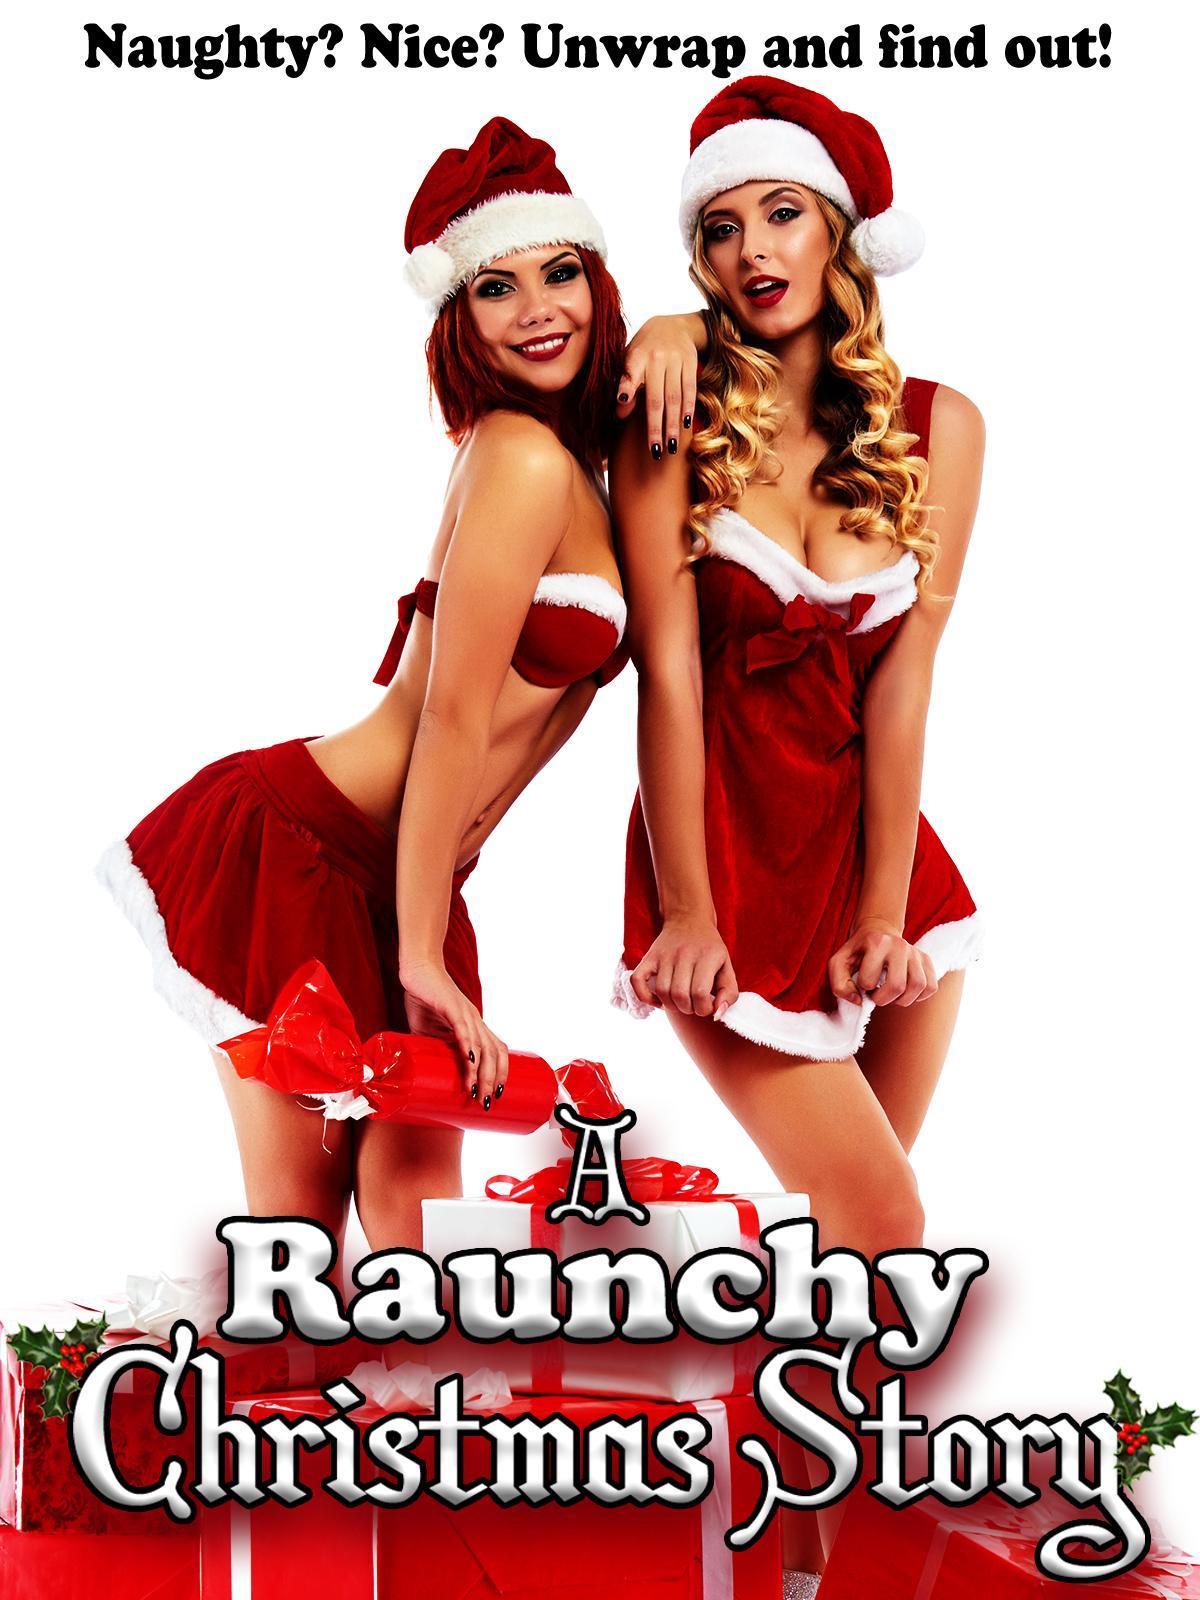 A-Raunchy-Christmas-Story-2020 Cast A Raunchy Christmas Story (2018)   Photo Gallery   IMDb